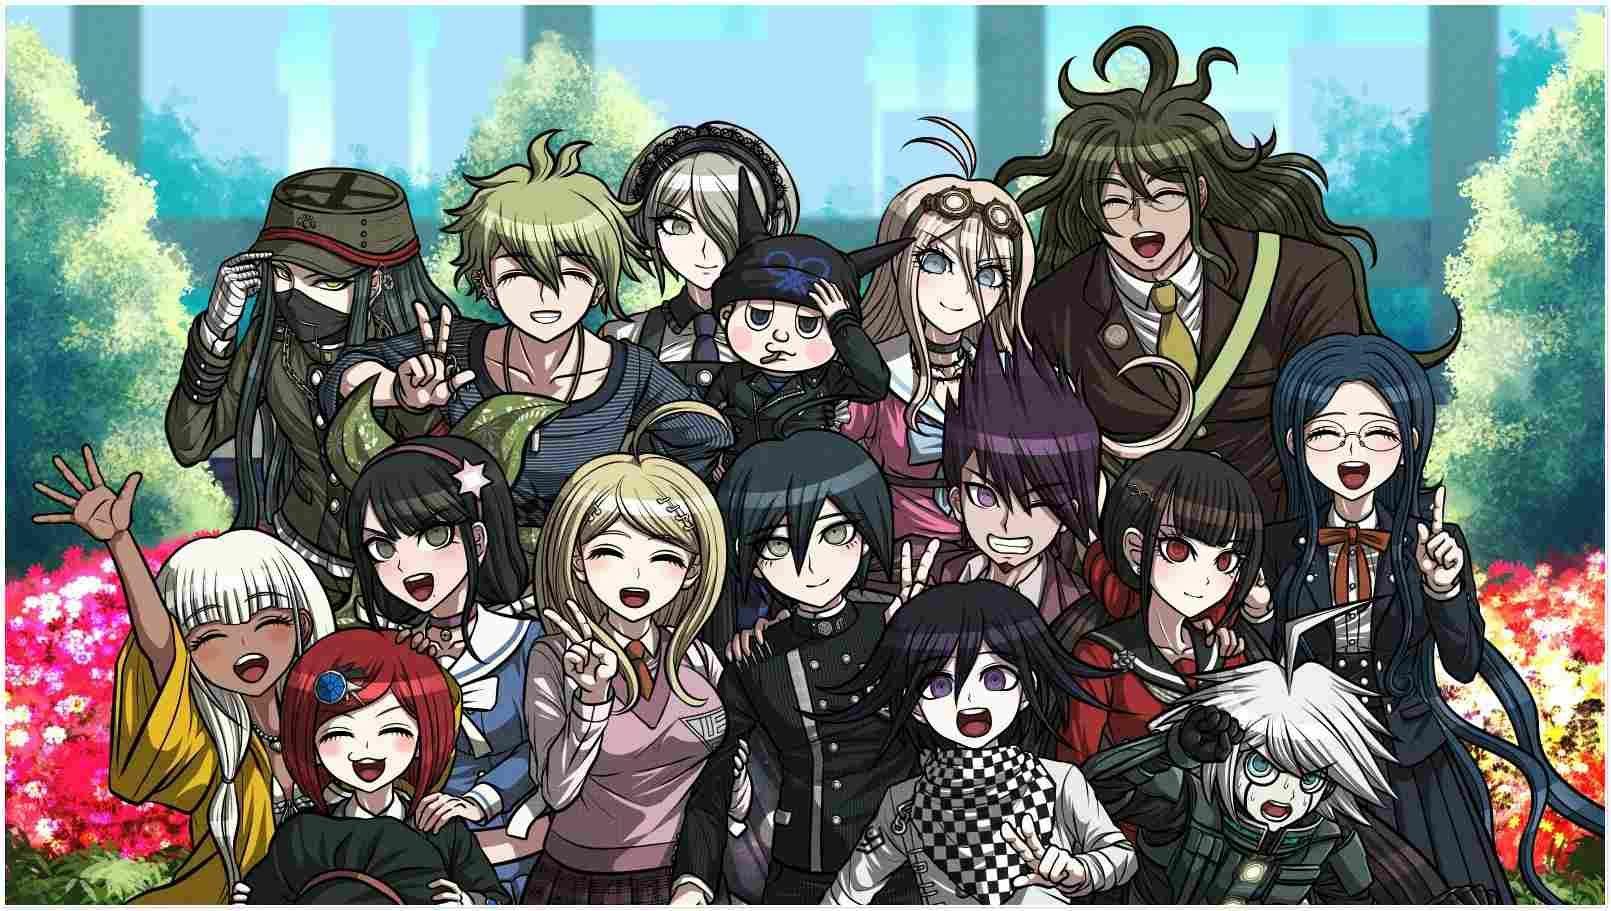 Best Of 13 Danganronpa V3 Wallpapers Danganronpa Danganronpa V3 Anime